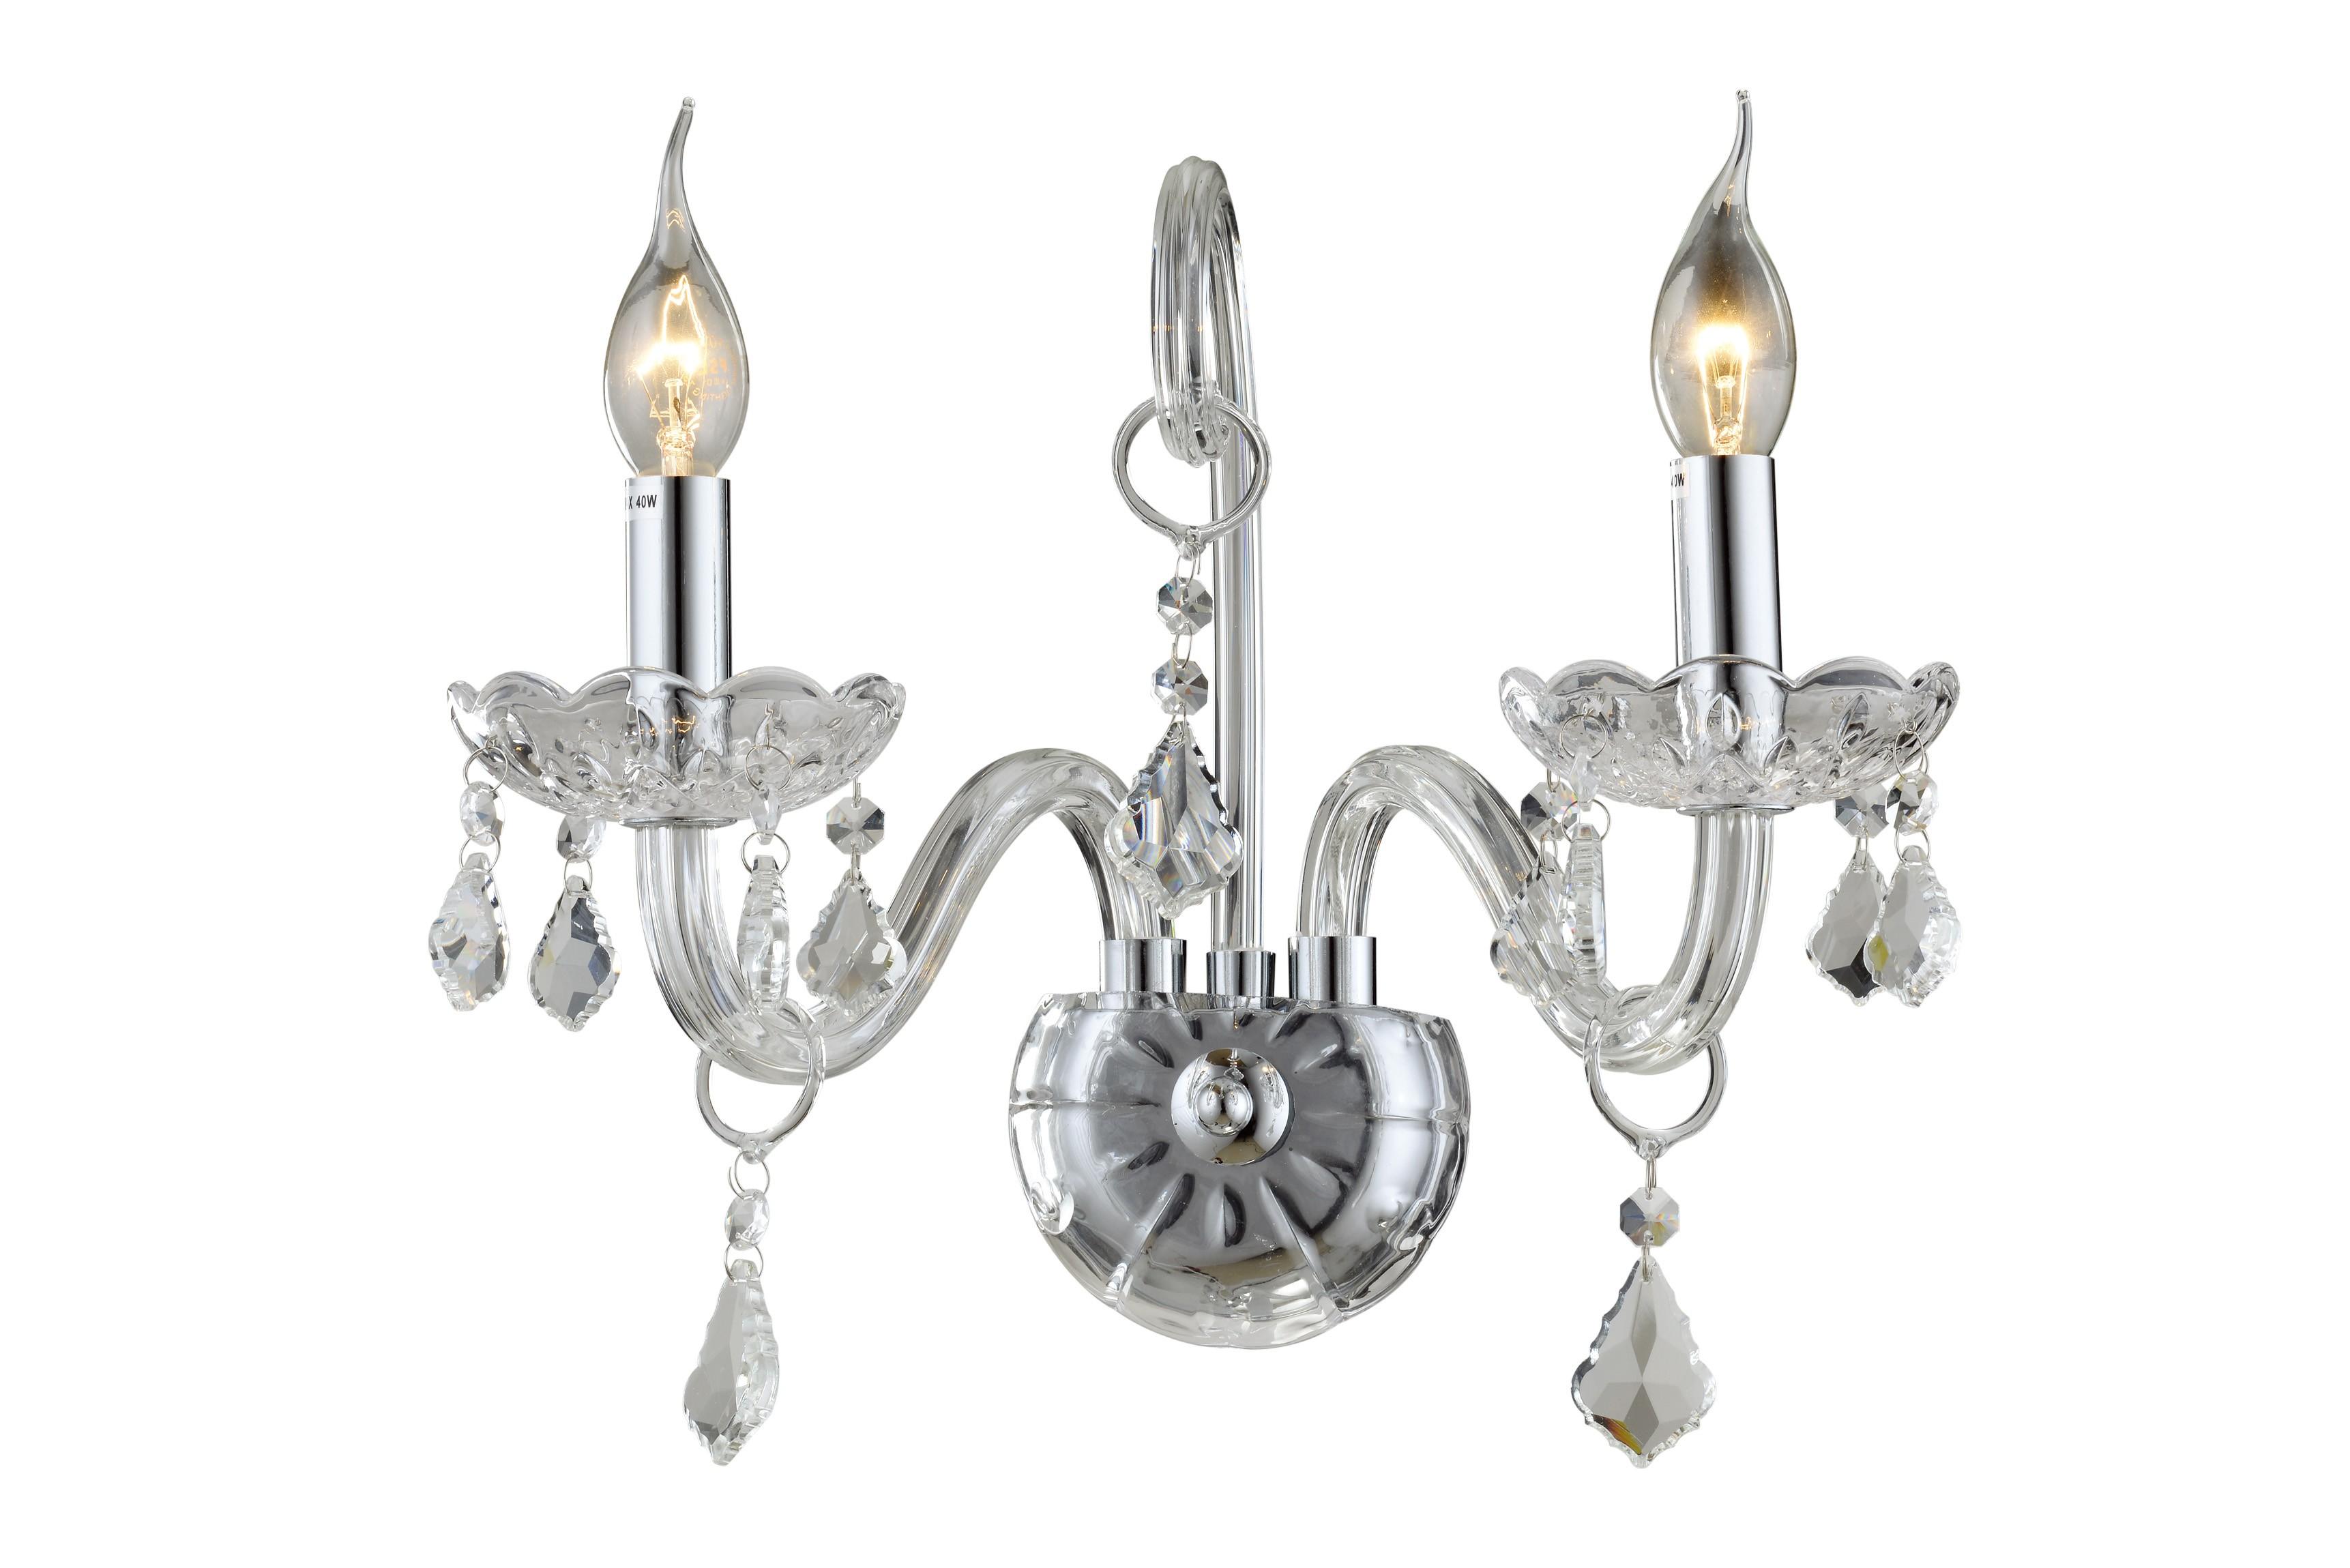 Arandela de Cristal Maria Thereza transparente 2 Lâmpadas